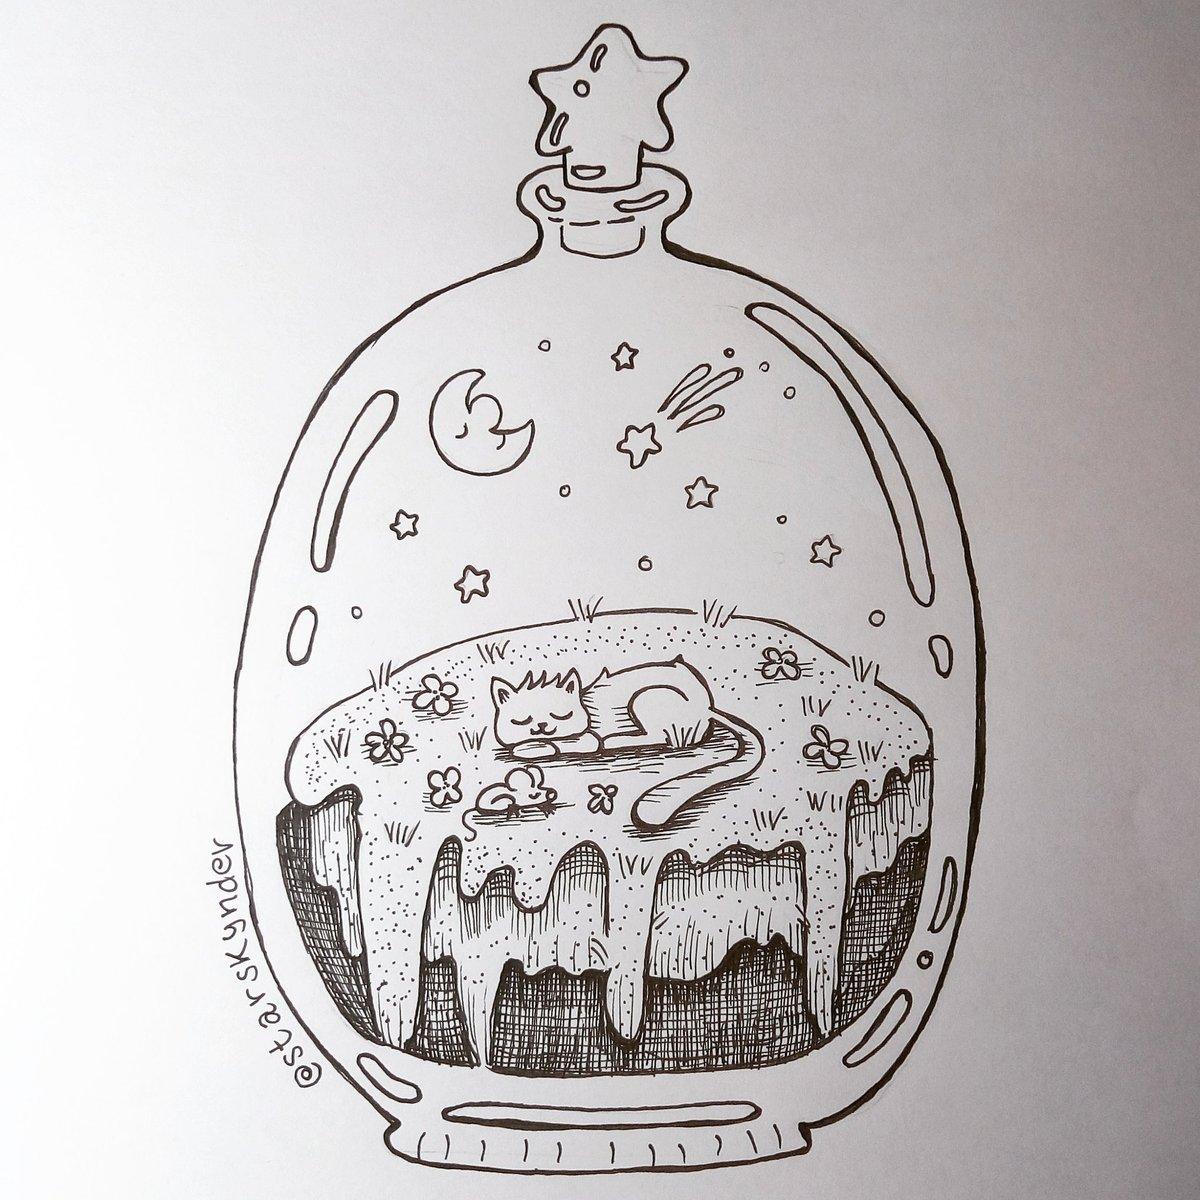 Starskynder On Twitter Purrfect Dreams Inktober Inktober2018 Drawlloween Drawing Draw Doodle Dailydoodle Illustrator Illustration Art Artwork Cat Terrarium Cute Https T Co Khnvjxv3oz